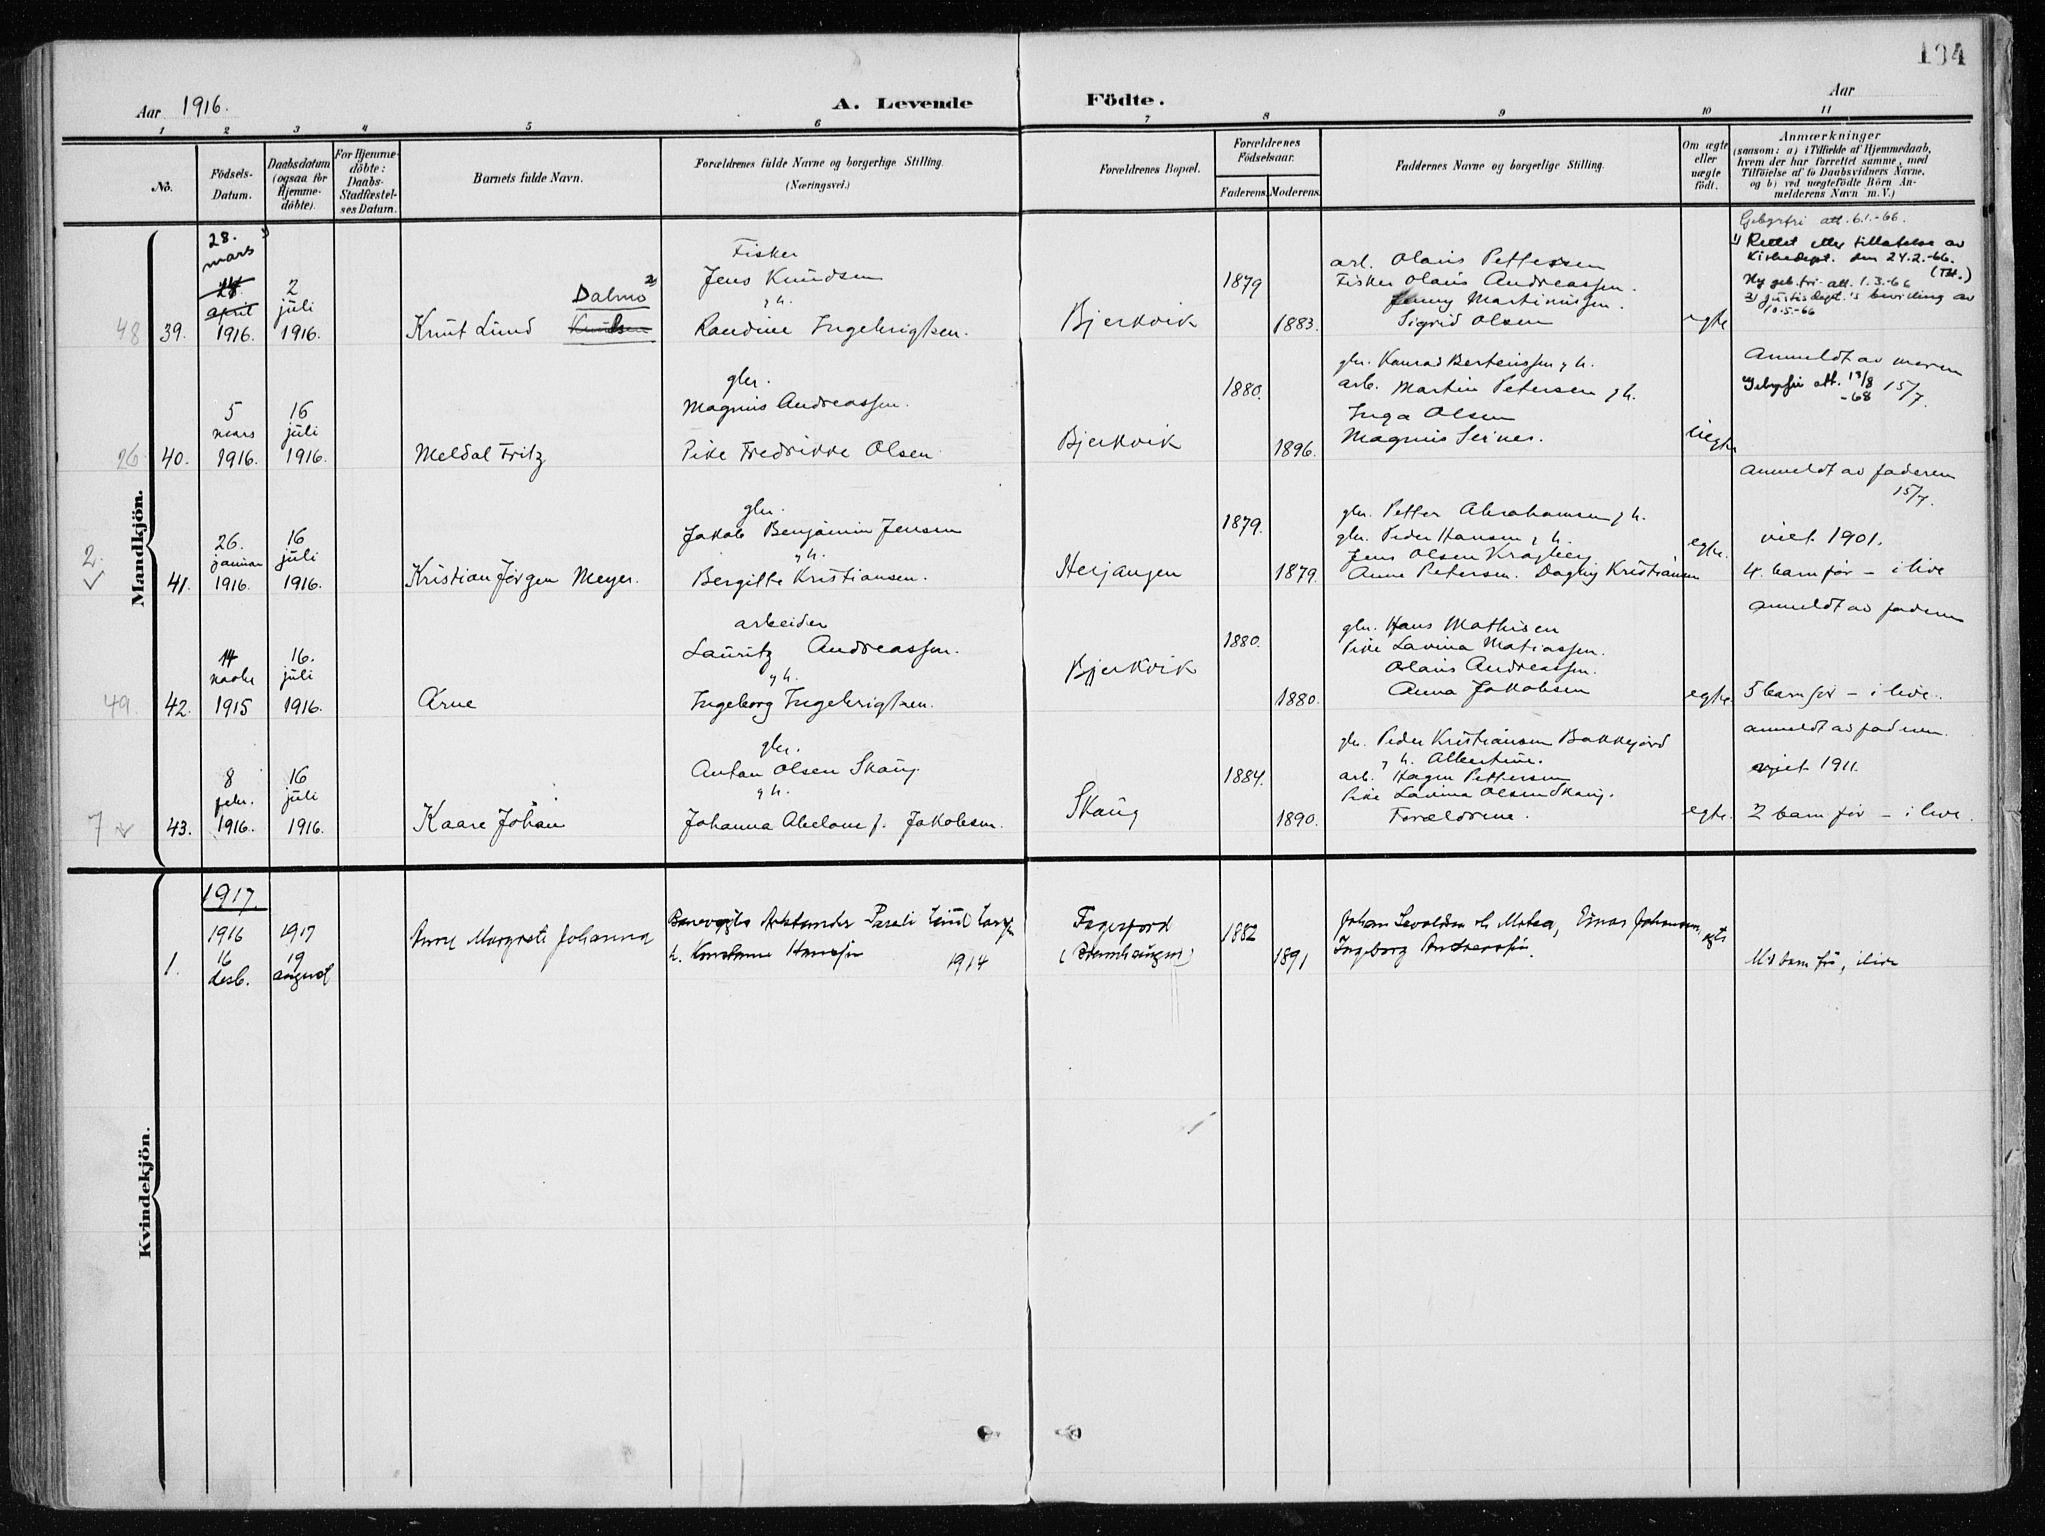 SAT, Ministerialprotokoller, klokkerbøker og fødselsregistre - Nordland, 866/L0941: Ministerialbok nr. 866A04, 1901-1917, s. 194